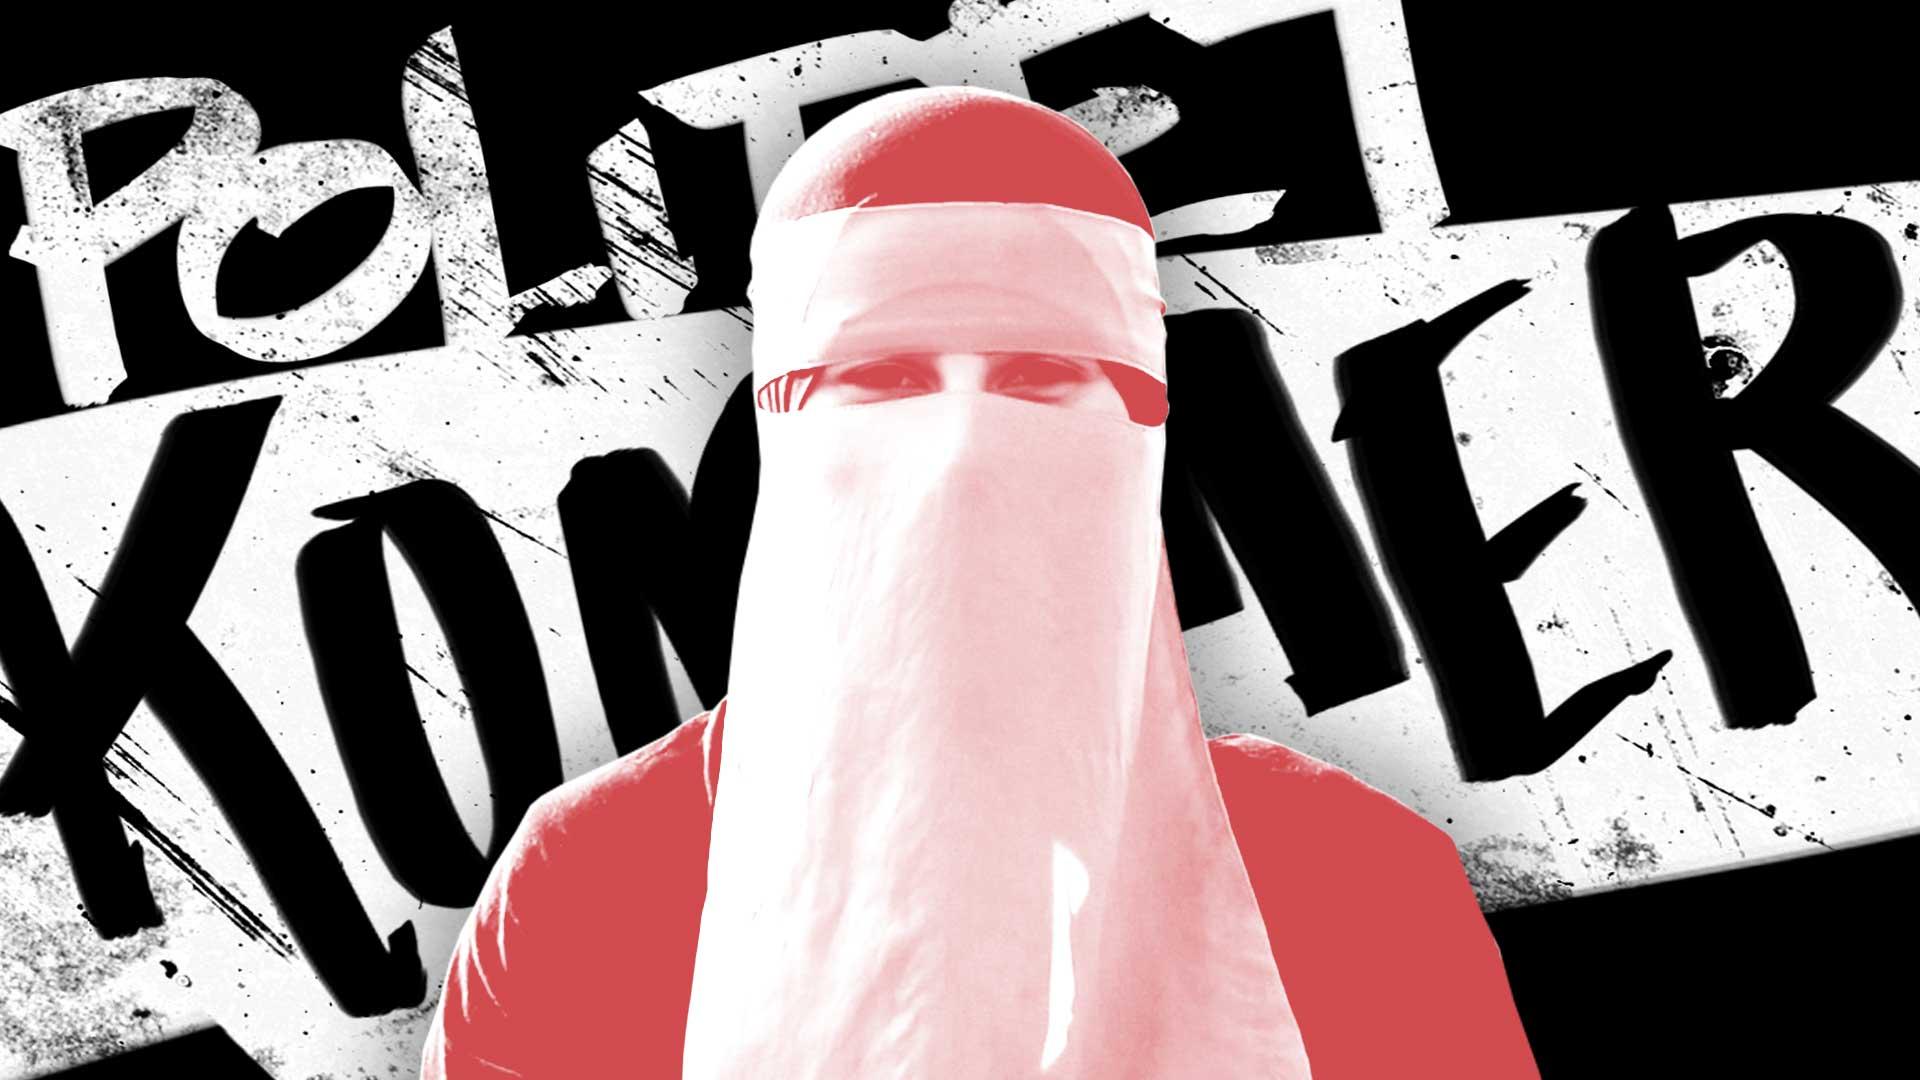 Meryem bryder 'burkaloven': – Jeg har max 10 minutter før politiet kommer